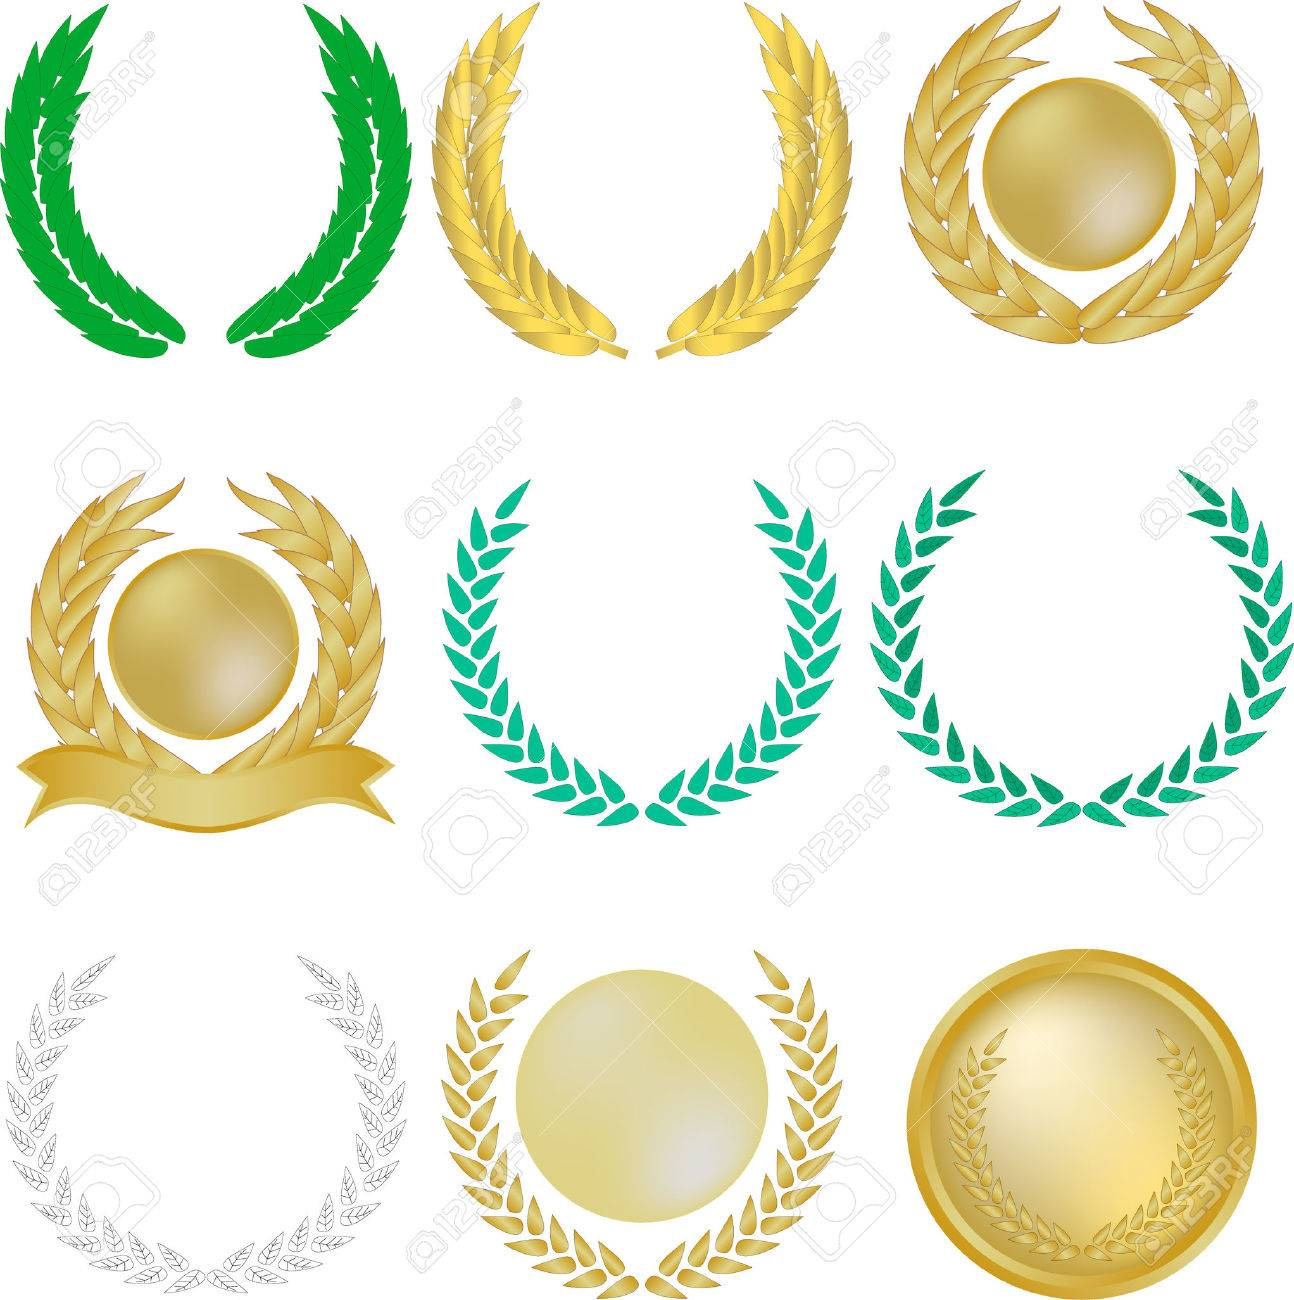 Set of nine laurel wreaths and banners Stock Vector - 3842021